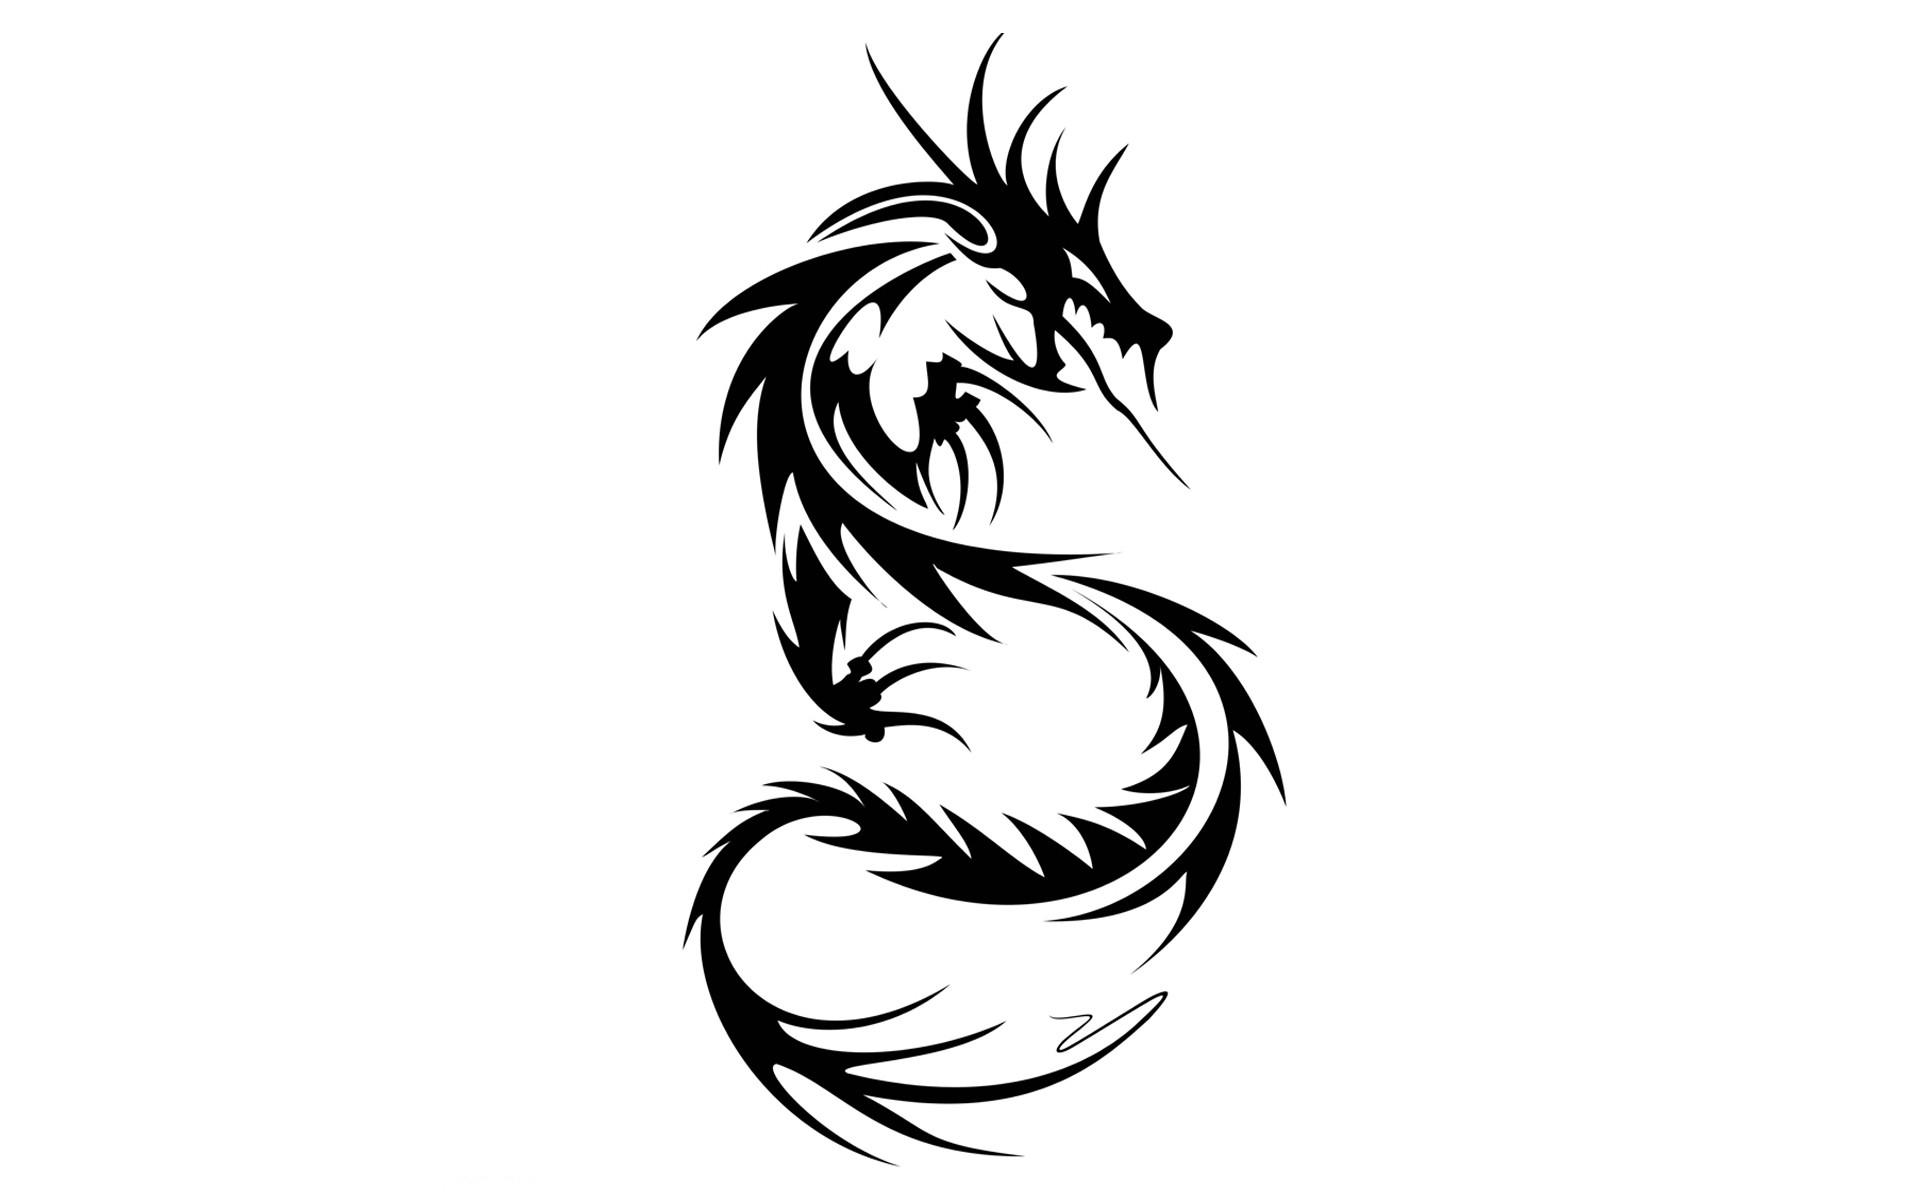 Res: 1920x1200, Dragon Tattoo Wallpaper High Resolution #l4h60 - Ehiyo.com